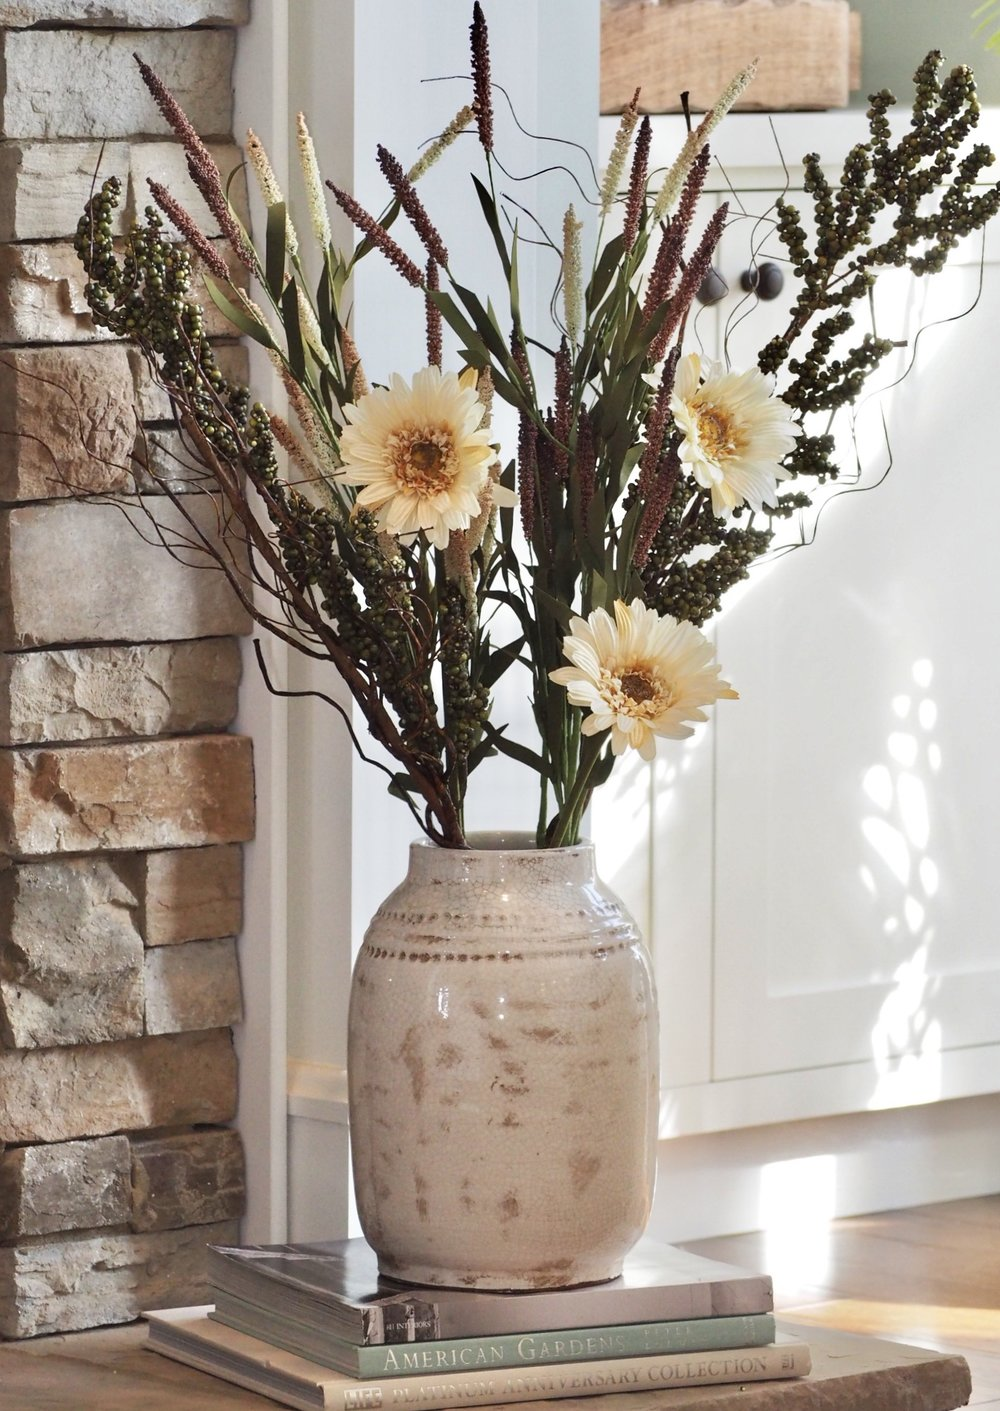 Vase and filler from Hobby Lobby.